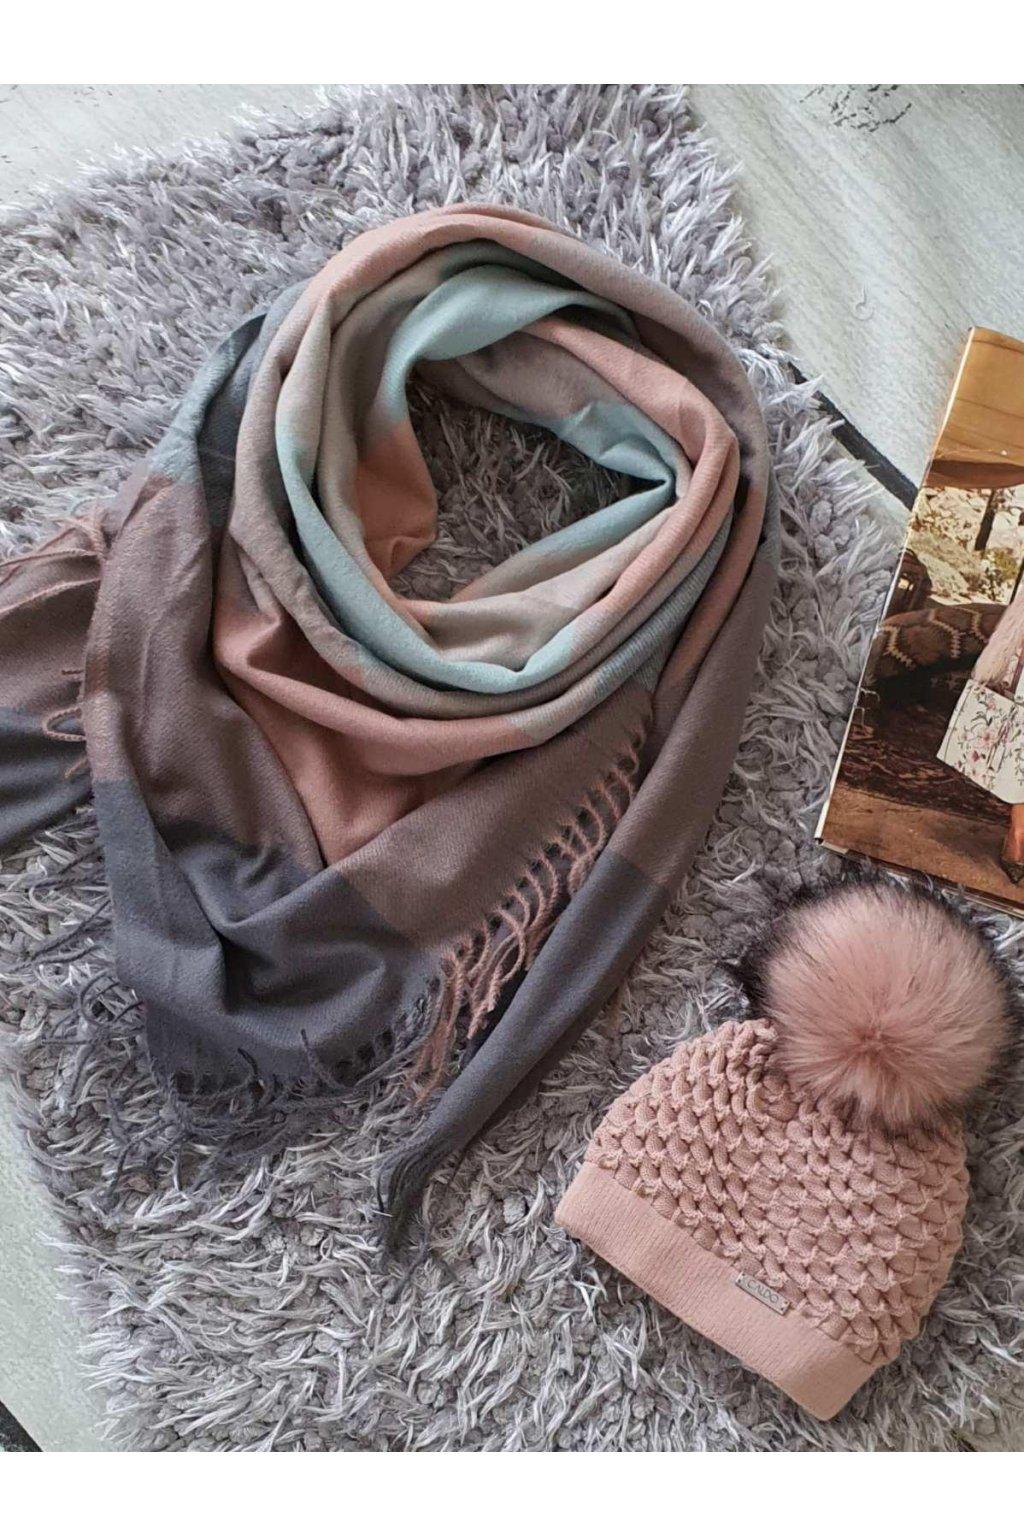 sladěný set čepice a maxišátku do růžova a mentolové barvy tip na dárek